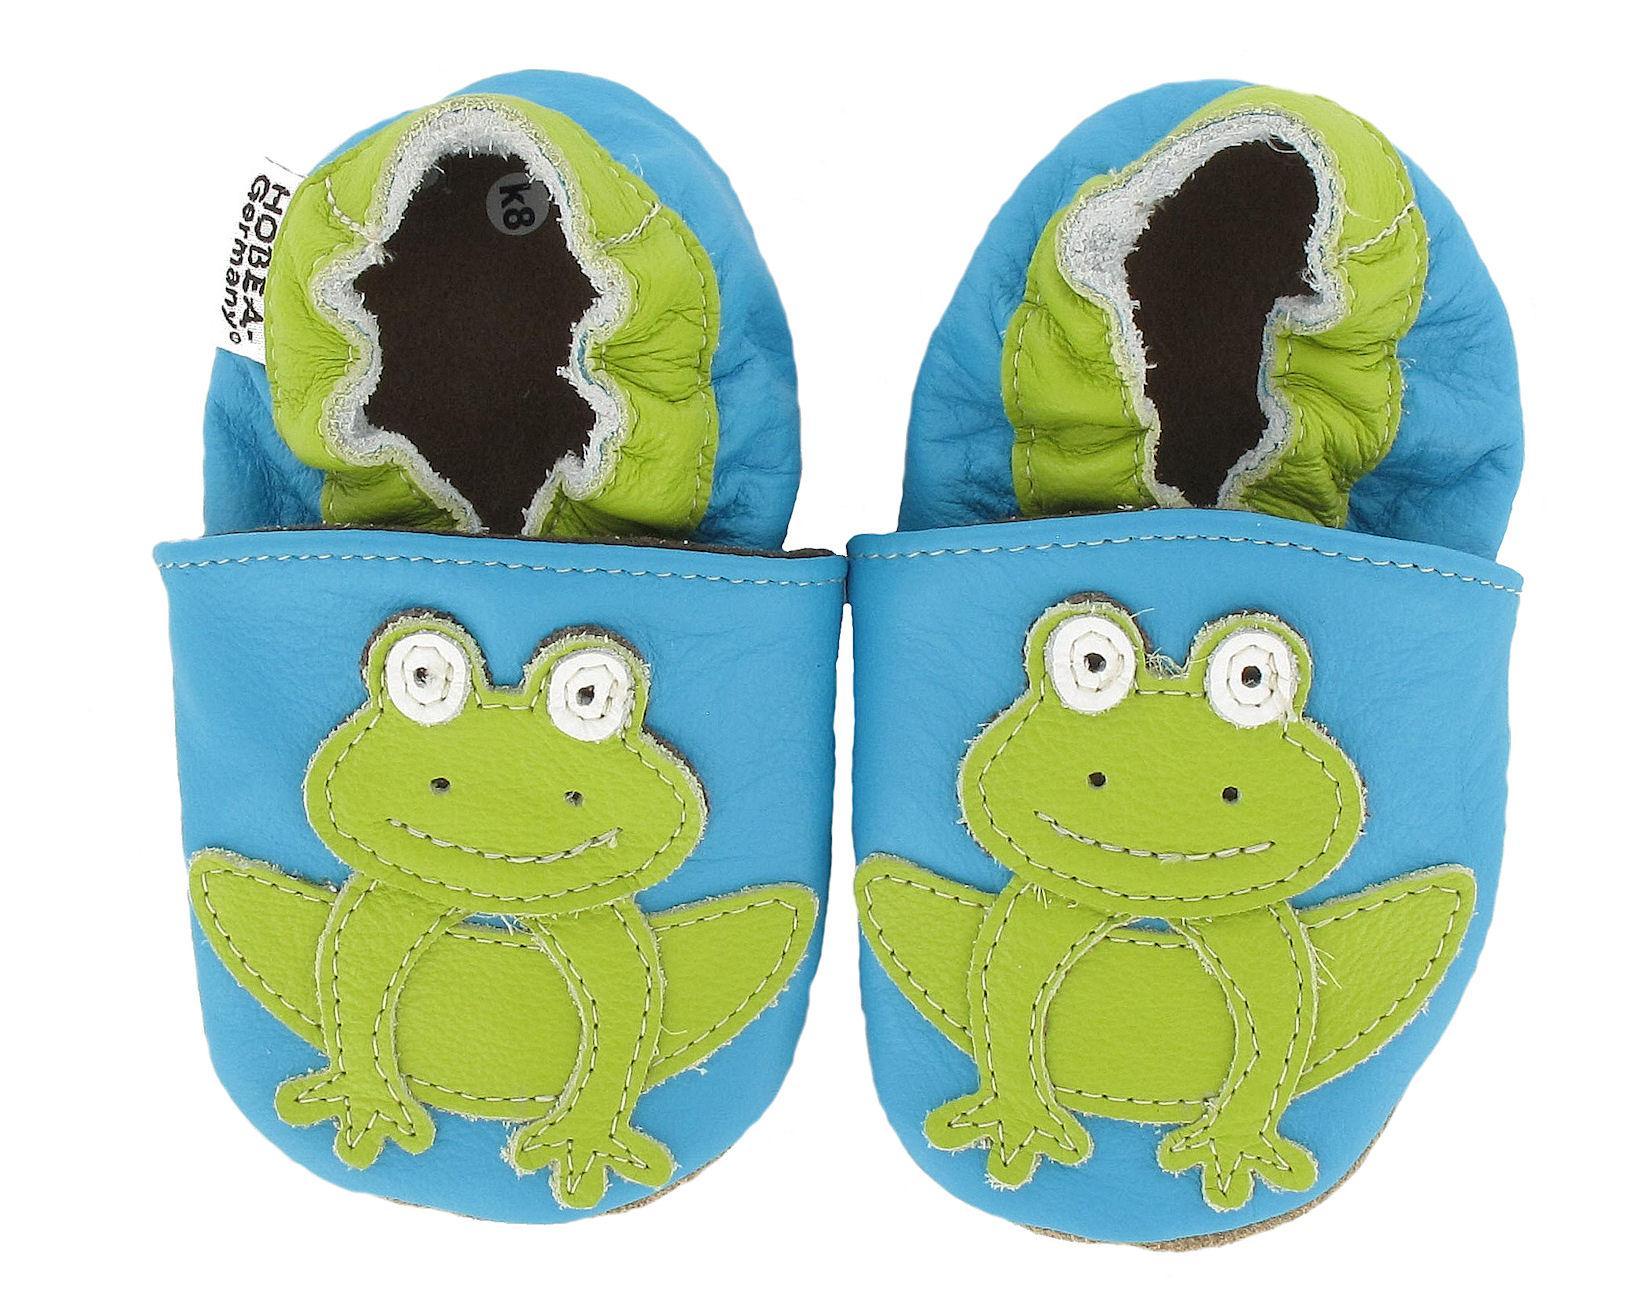 HOBEA-Germany Krabbelschuhe Frosch: Amazon.de: Schuhe & Handtaschen